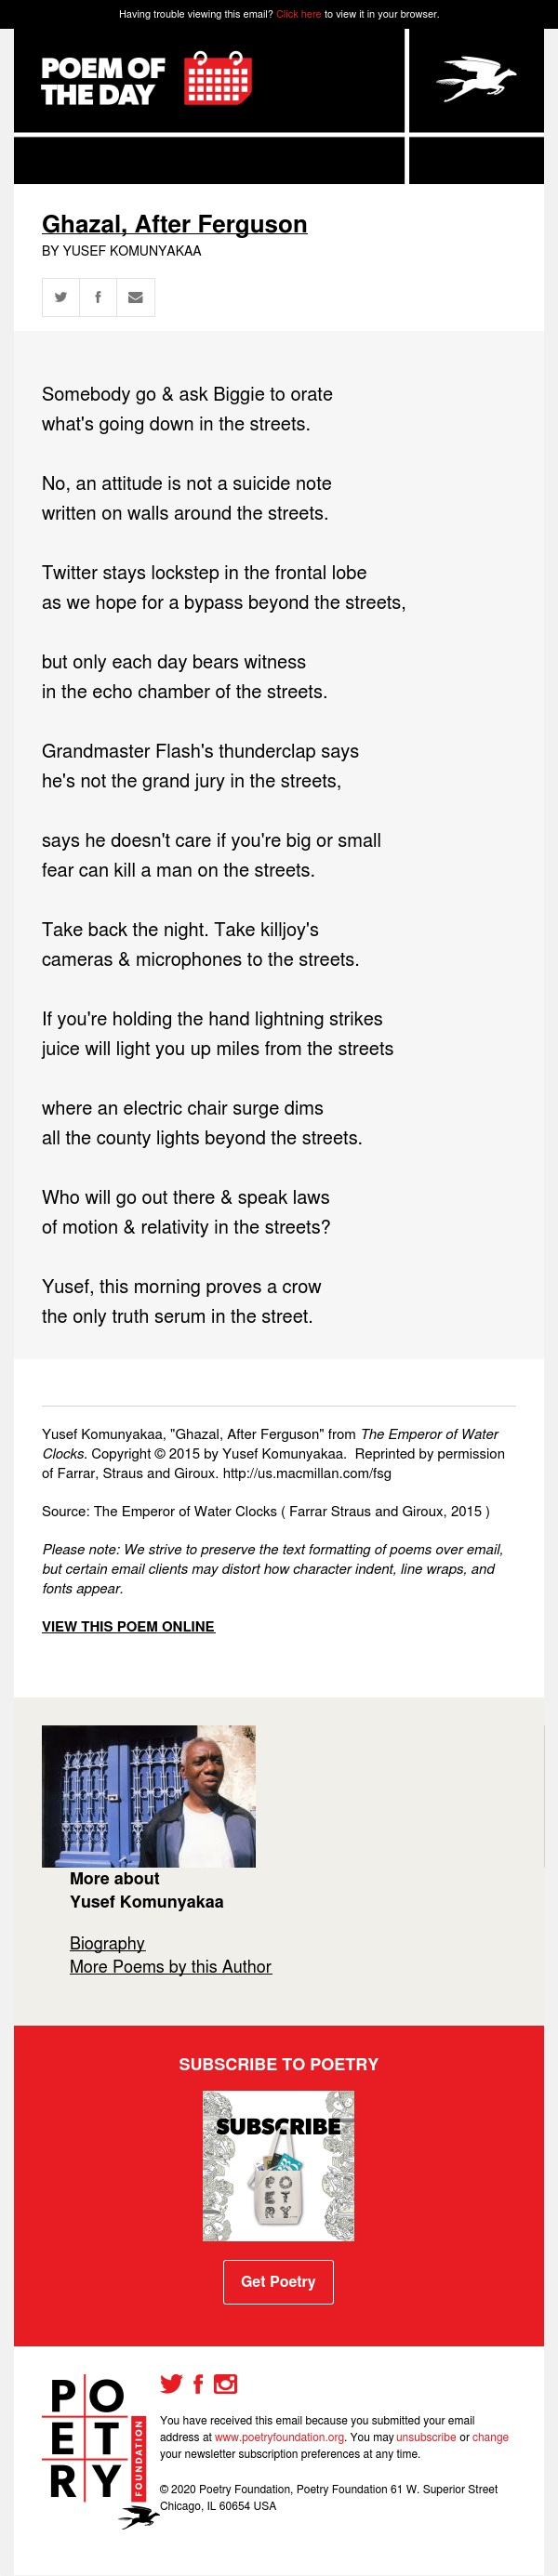 Poem of the Day: Ghazal, After Ferguson